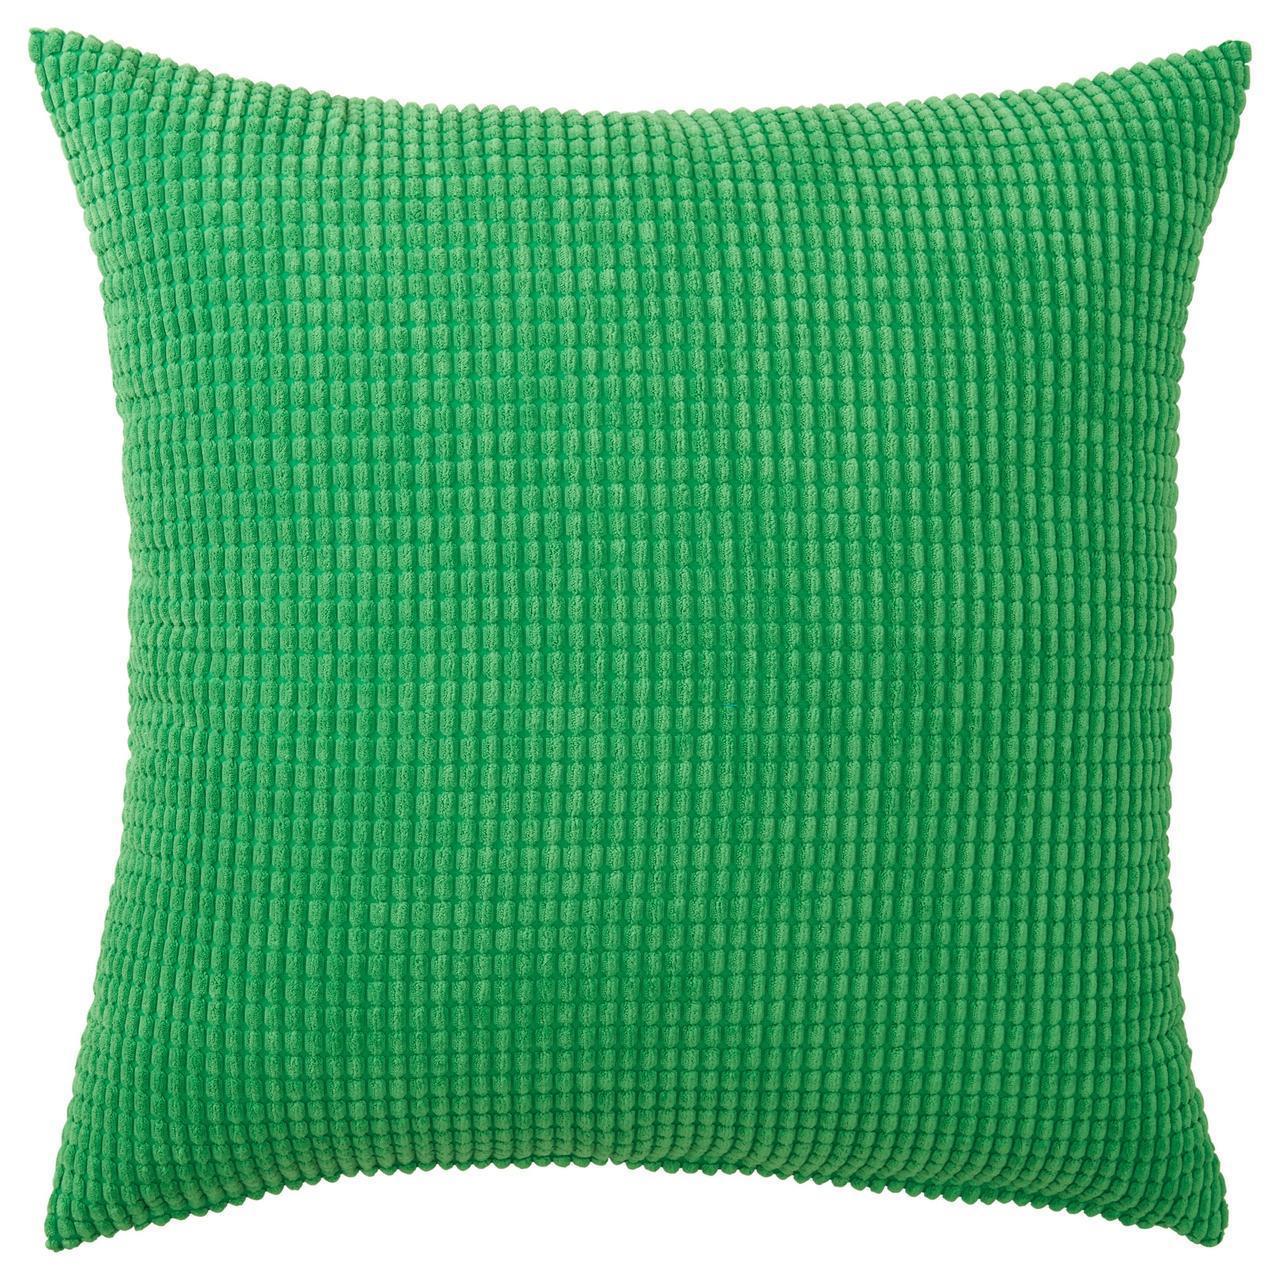 IKEA GULLKLOCKA Наволочка на декоративную подушку, зеленый  (403.166.82)